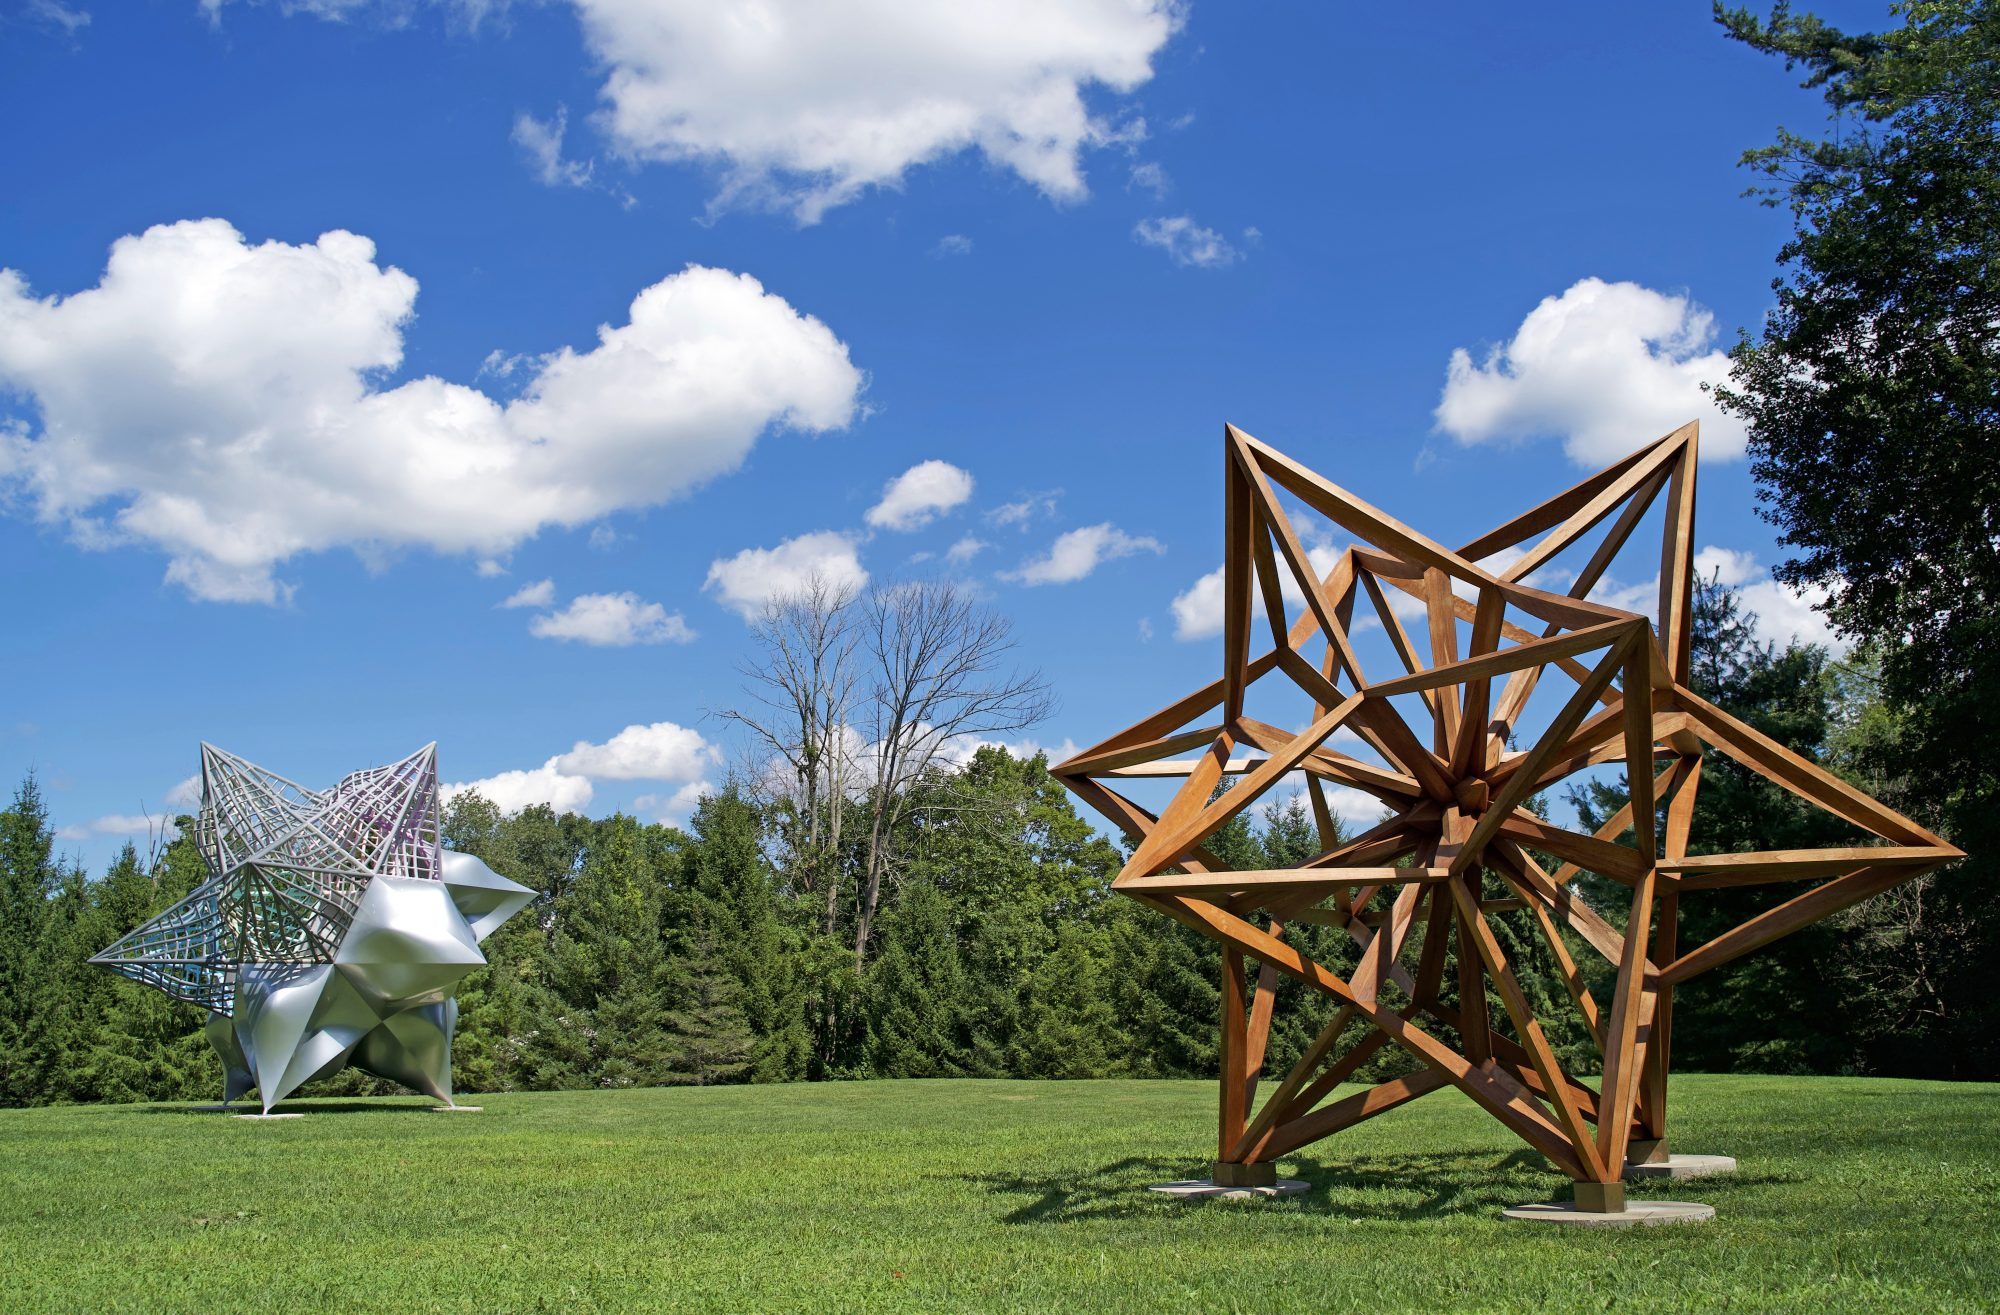 Frank Stella's Stars, A Survey